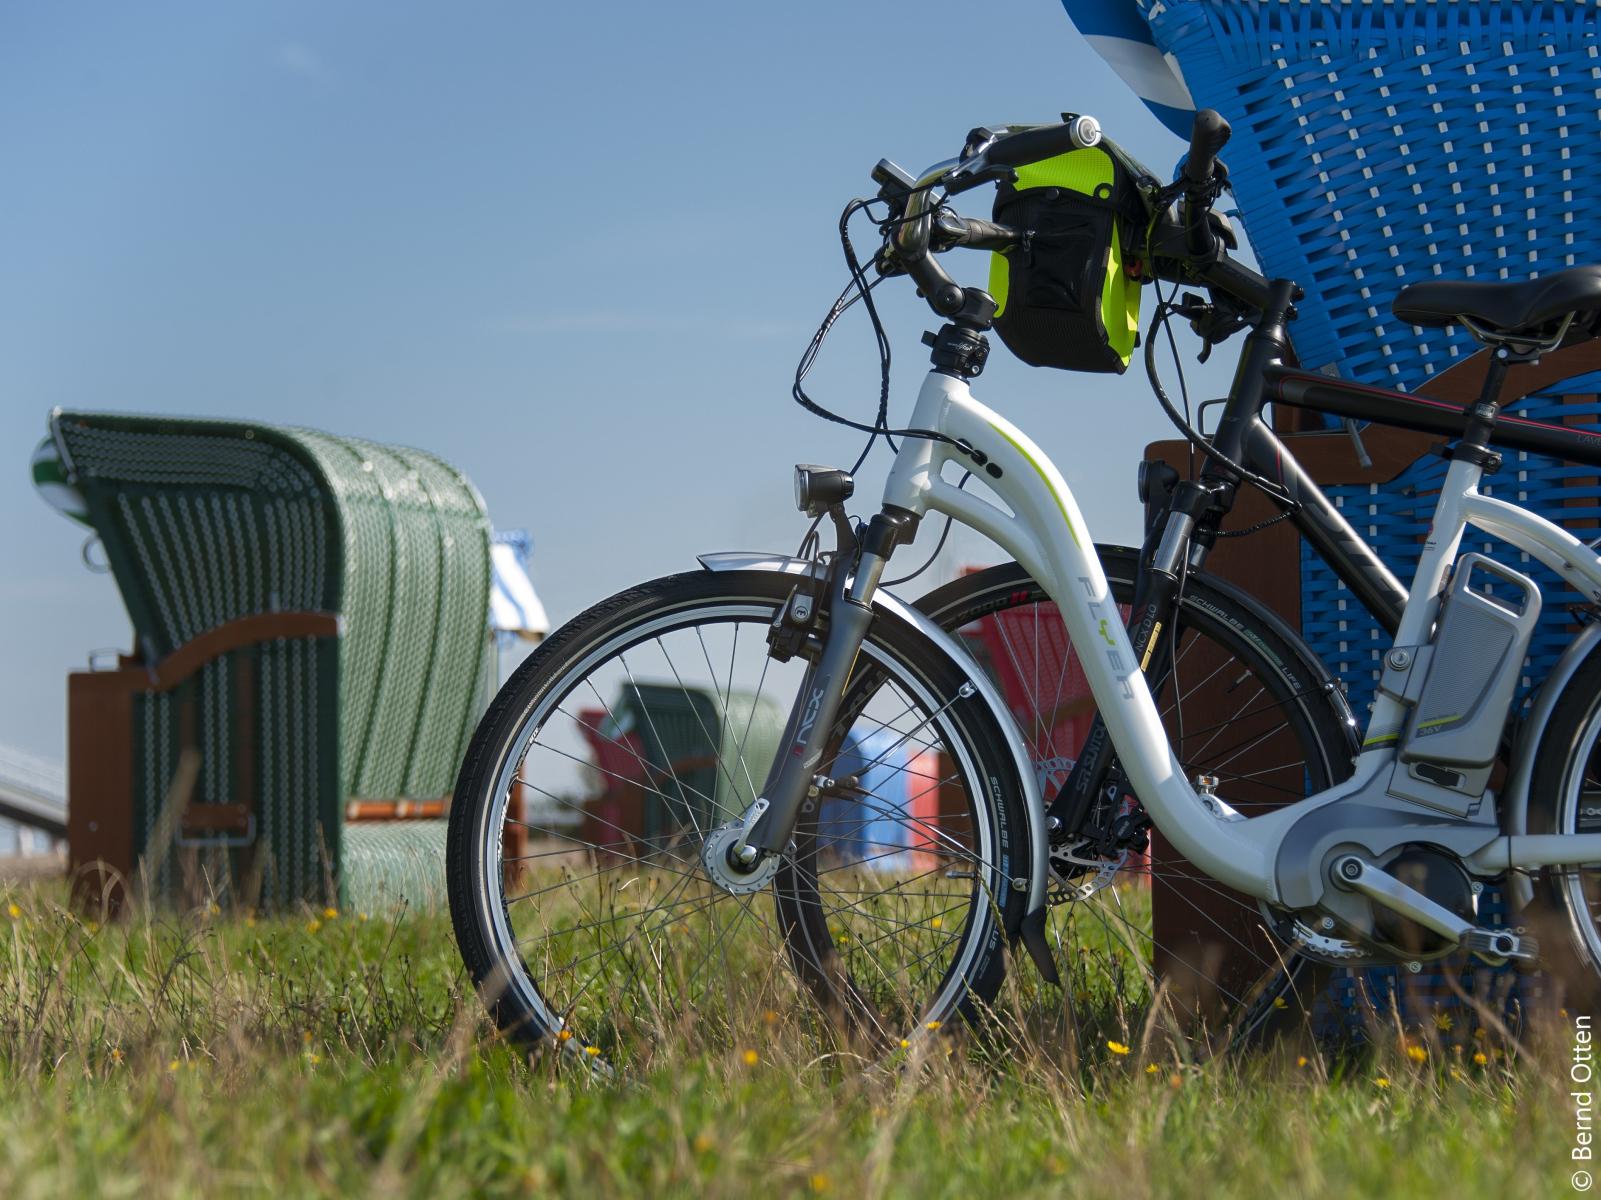 Fahrräder an den Strandkörben im Cuxland